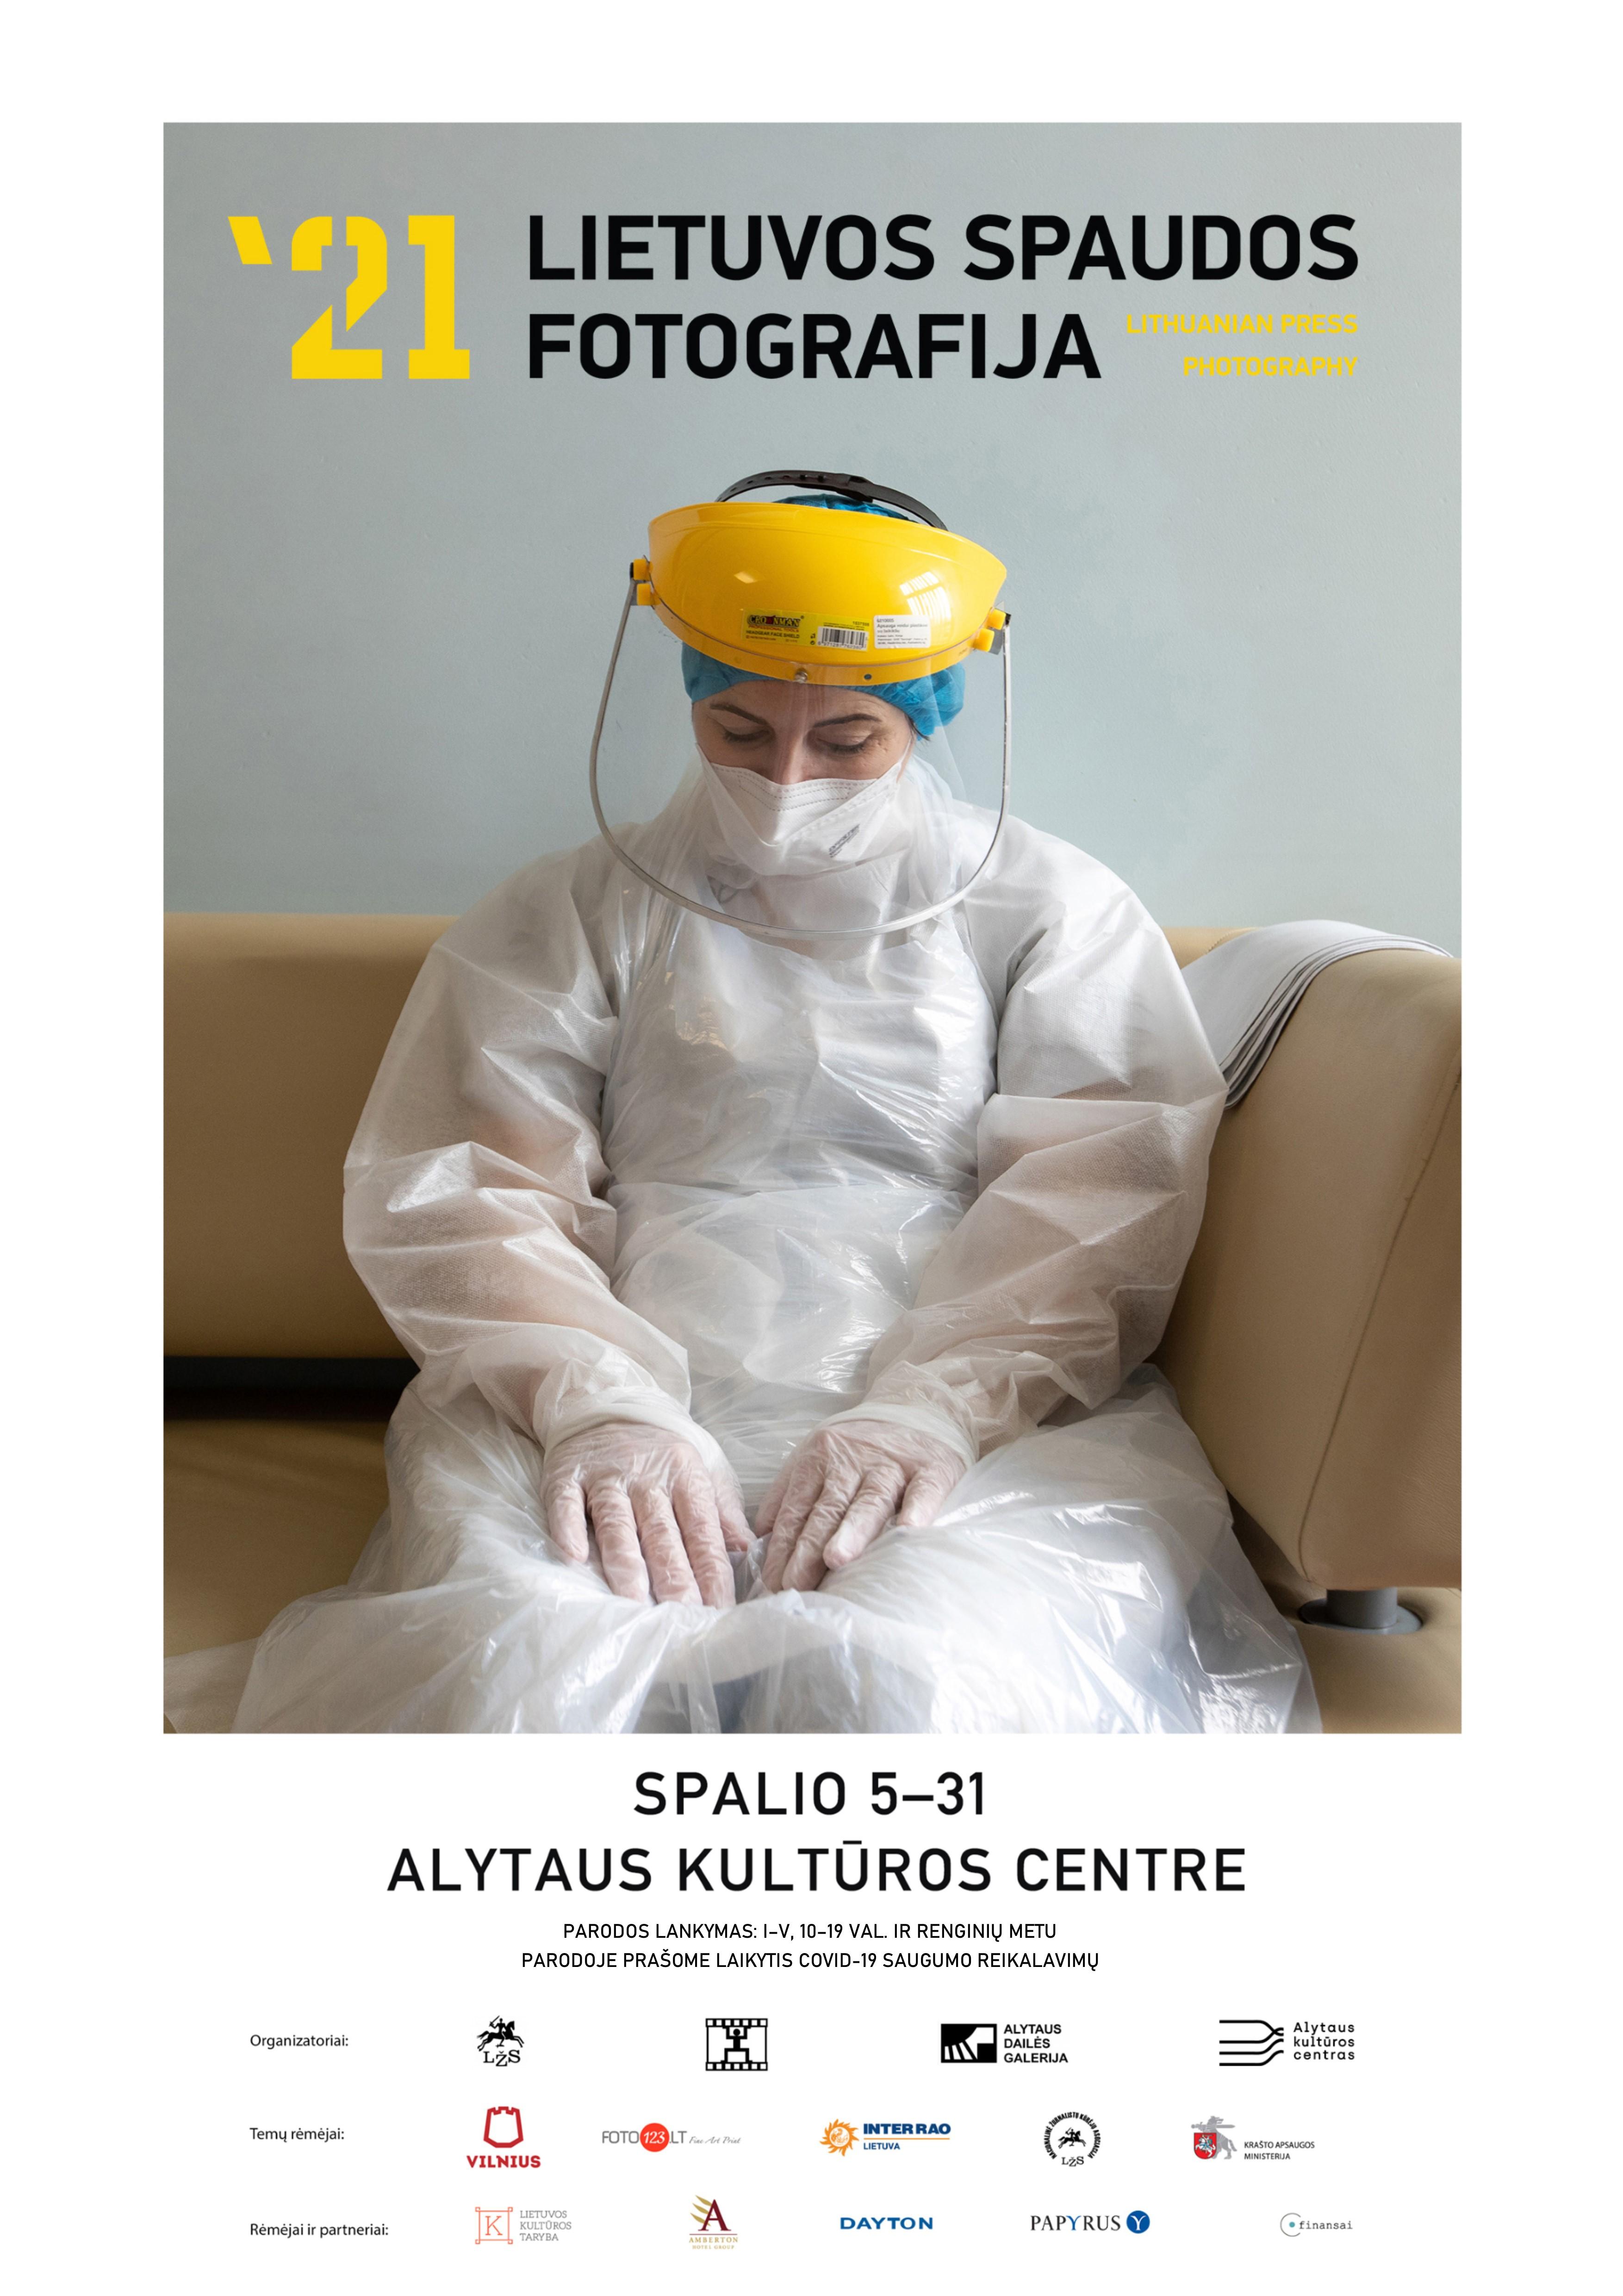 Lietuvos spaudos fotografija 2021 Plakatas